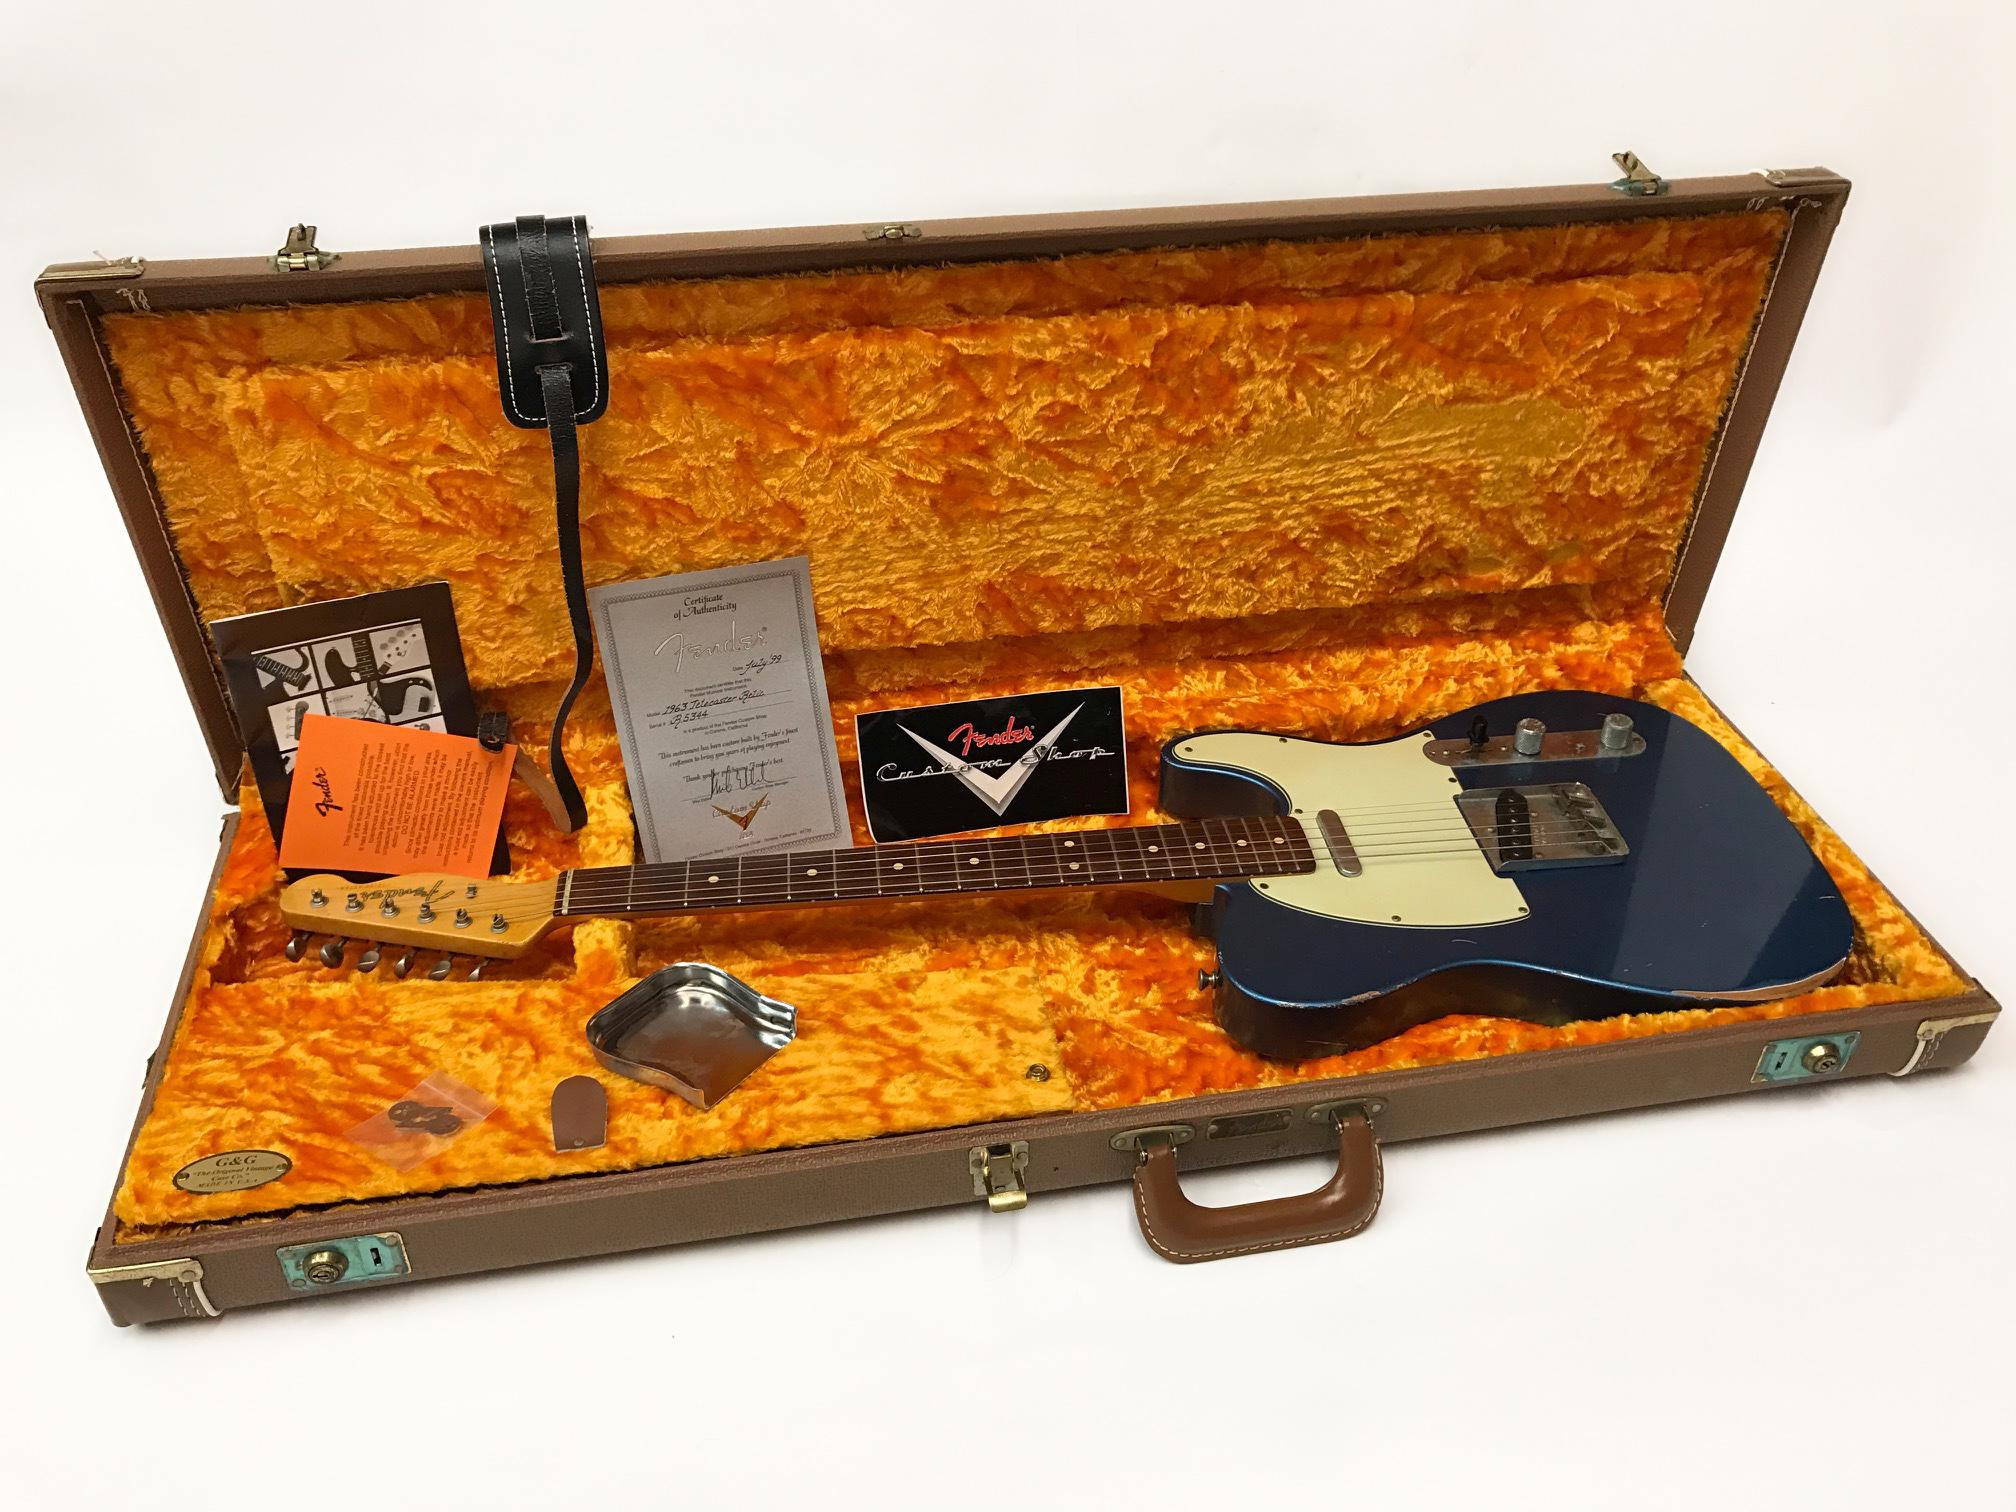 Fender Telecaster Custom Shop 63 Relic Pre Owned 1999 Model Lake Placid Blue Guitar For Sale